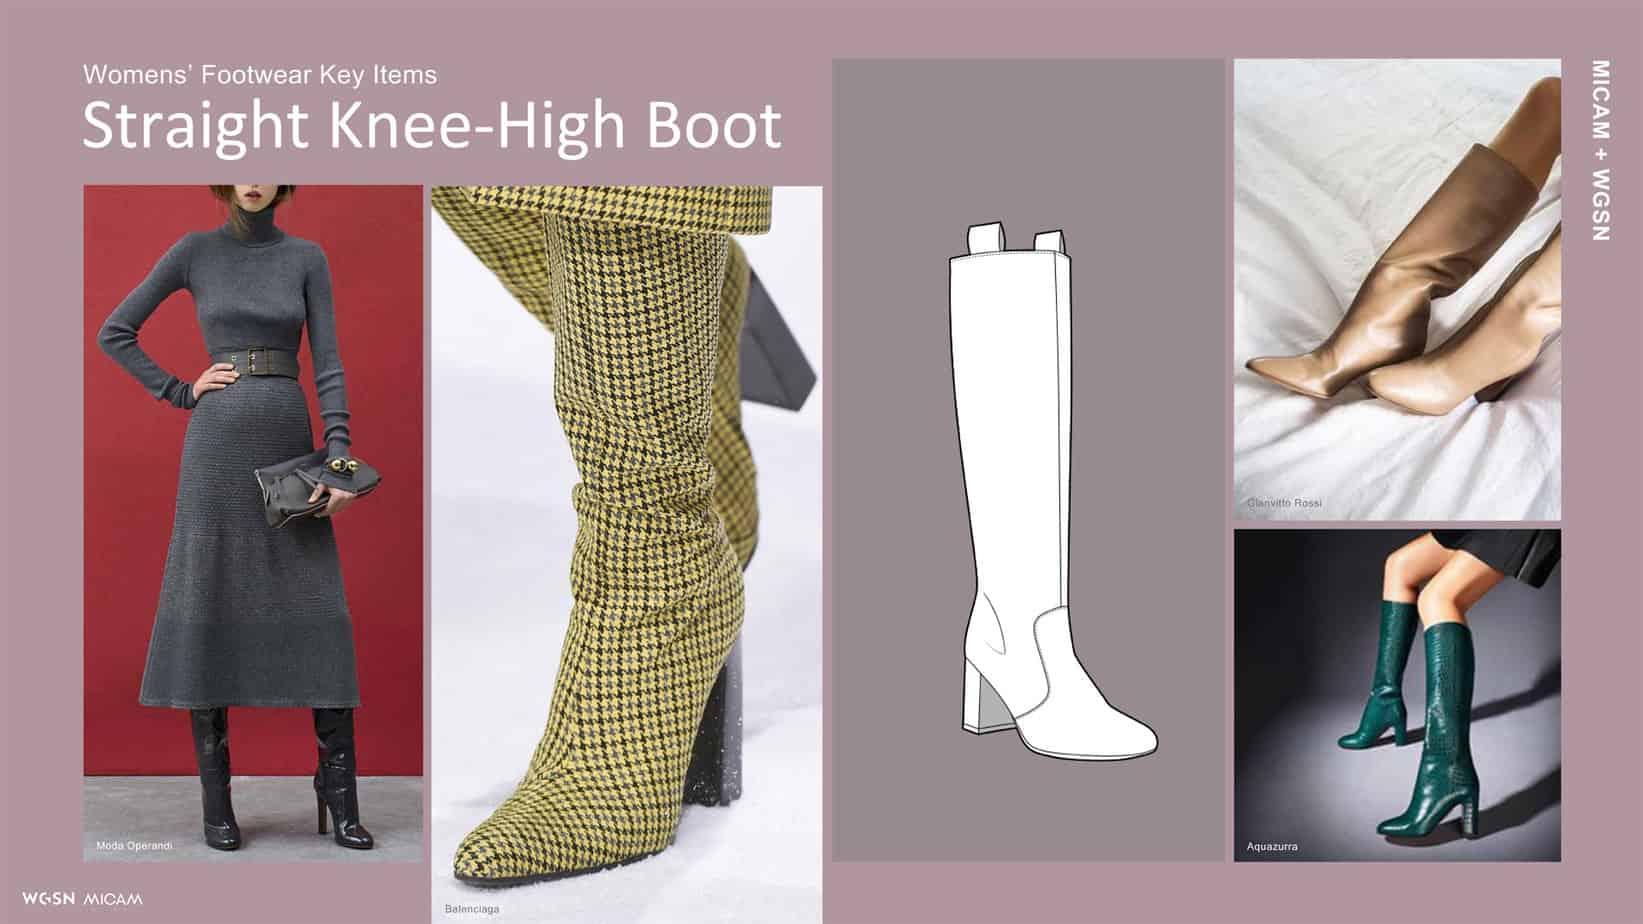 Womens' Footwear Key Items Straight Knee-High Boot